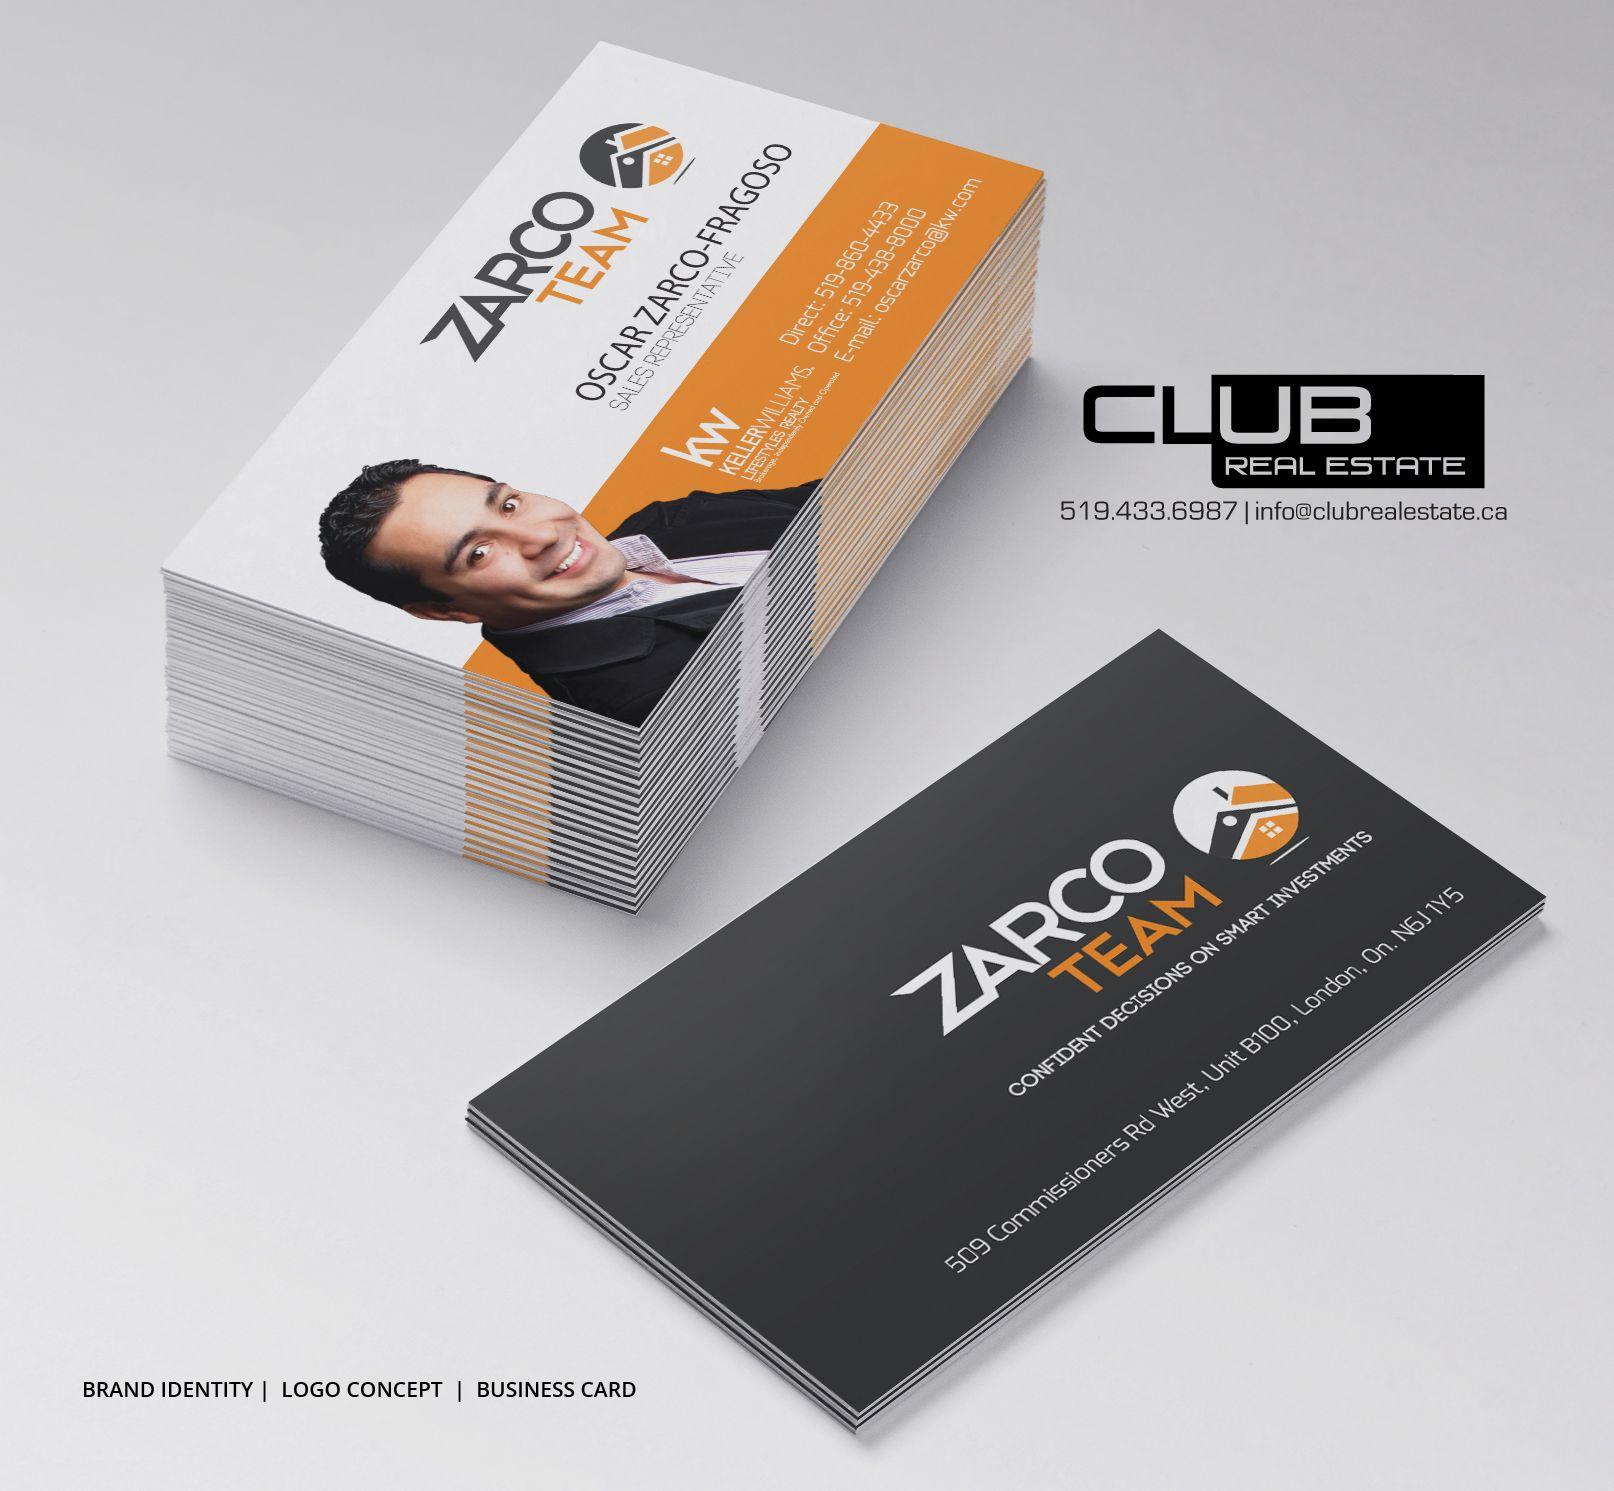 Custom Designed Business Cards - Club Real Estate | Real Estate ...